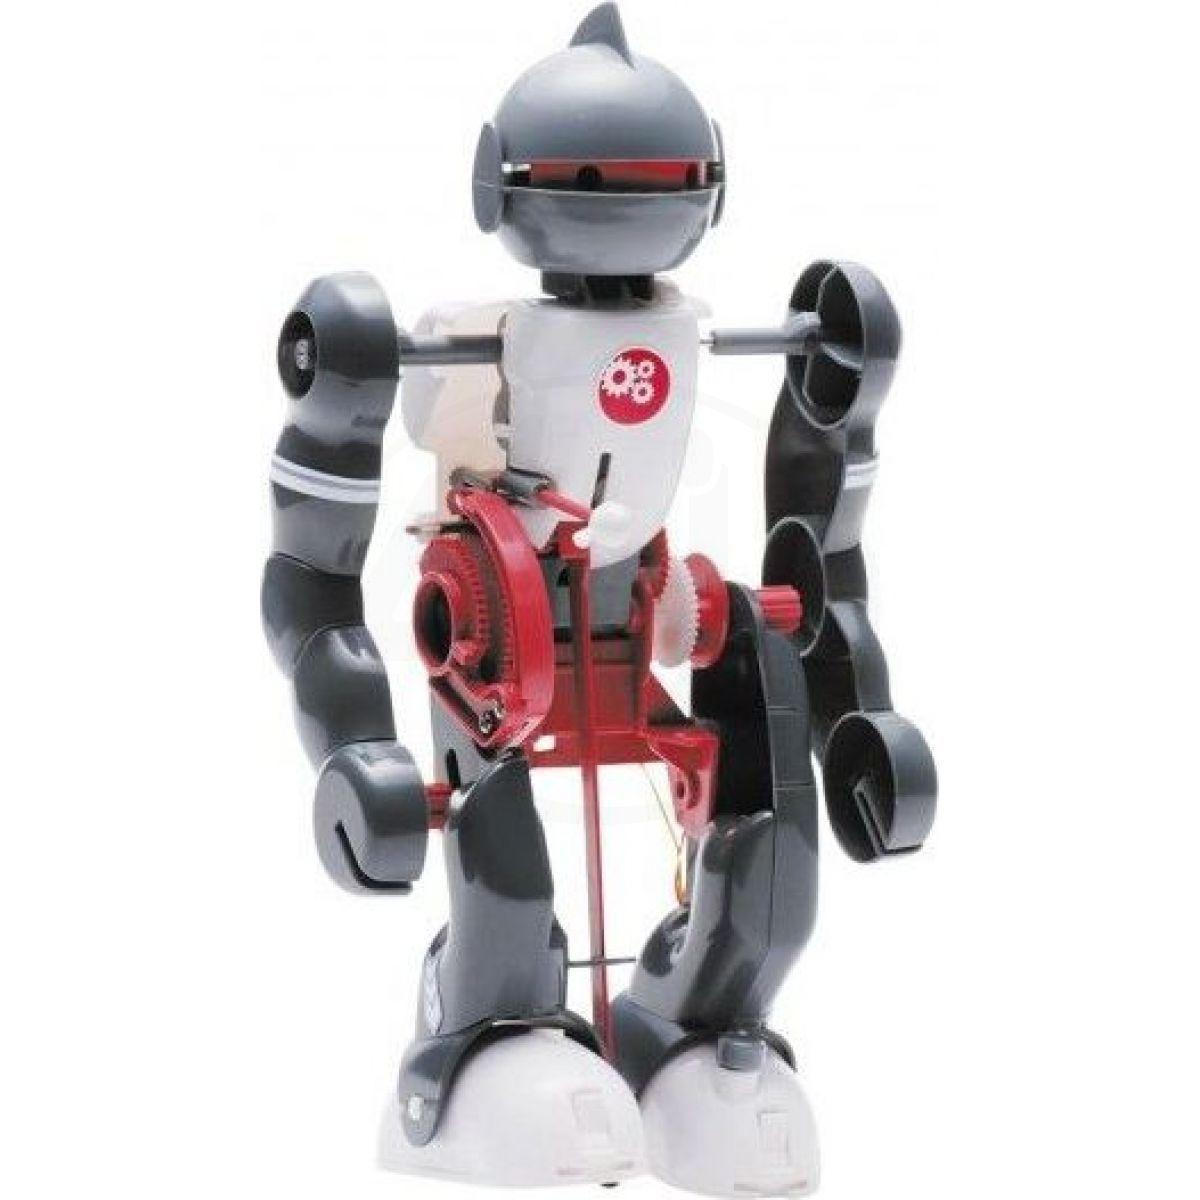 Конструктор Tumbling Robot (шагающий робот)